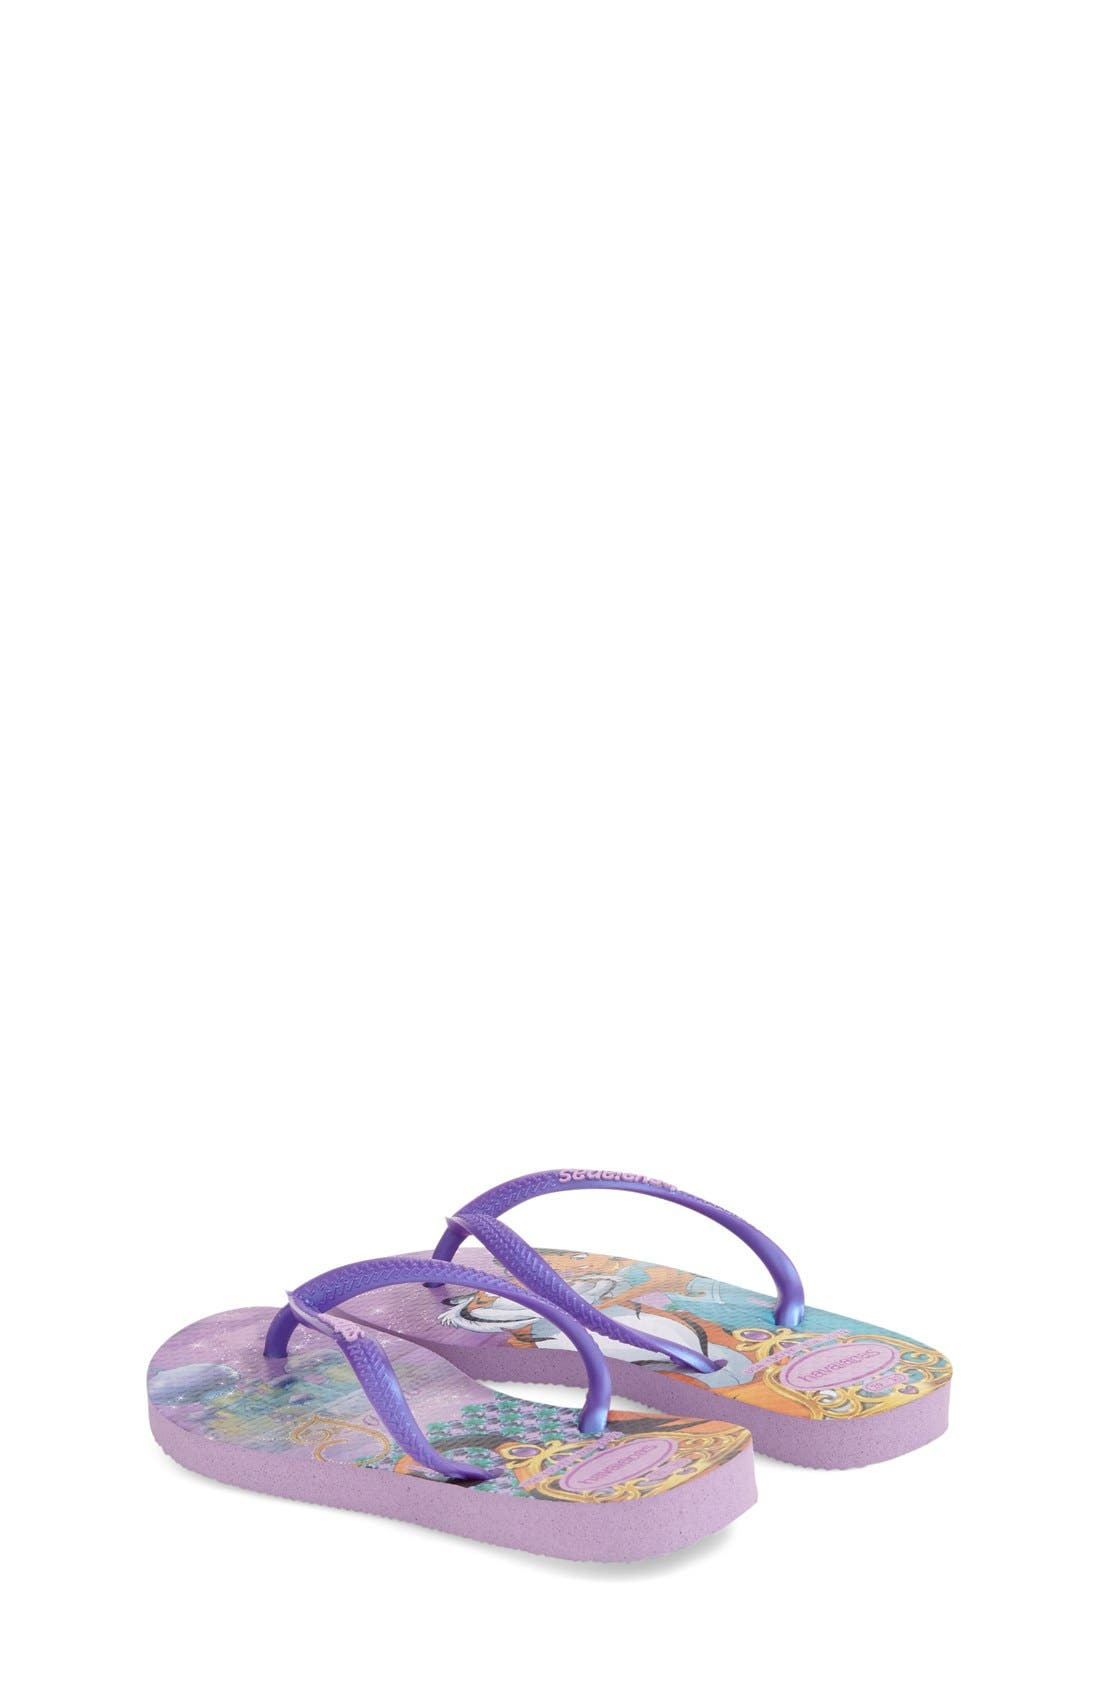 Alternate Image 2  - Havaianas 'Disney Princess' Flip Flops (Toddler & Little Kid)